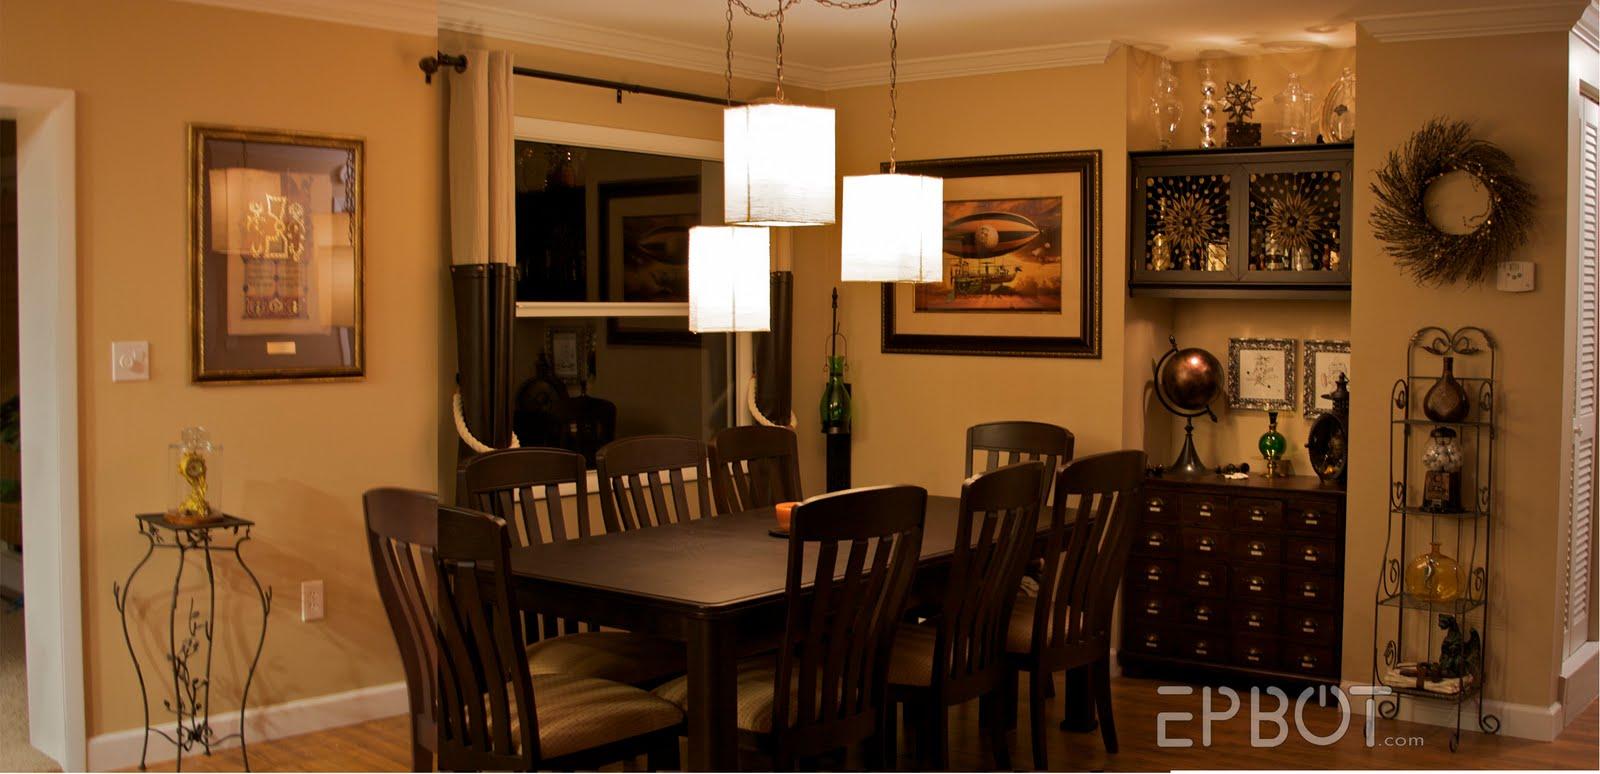 My Steampunk Dining Room